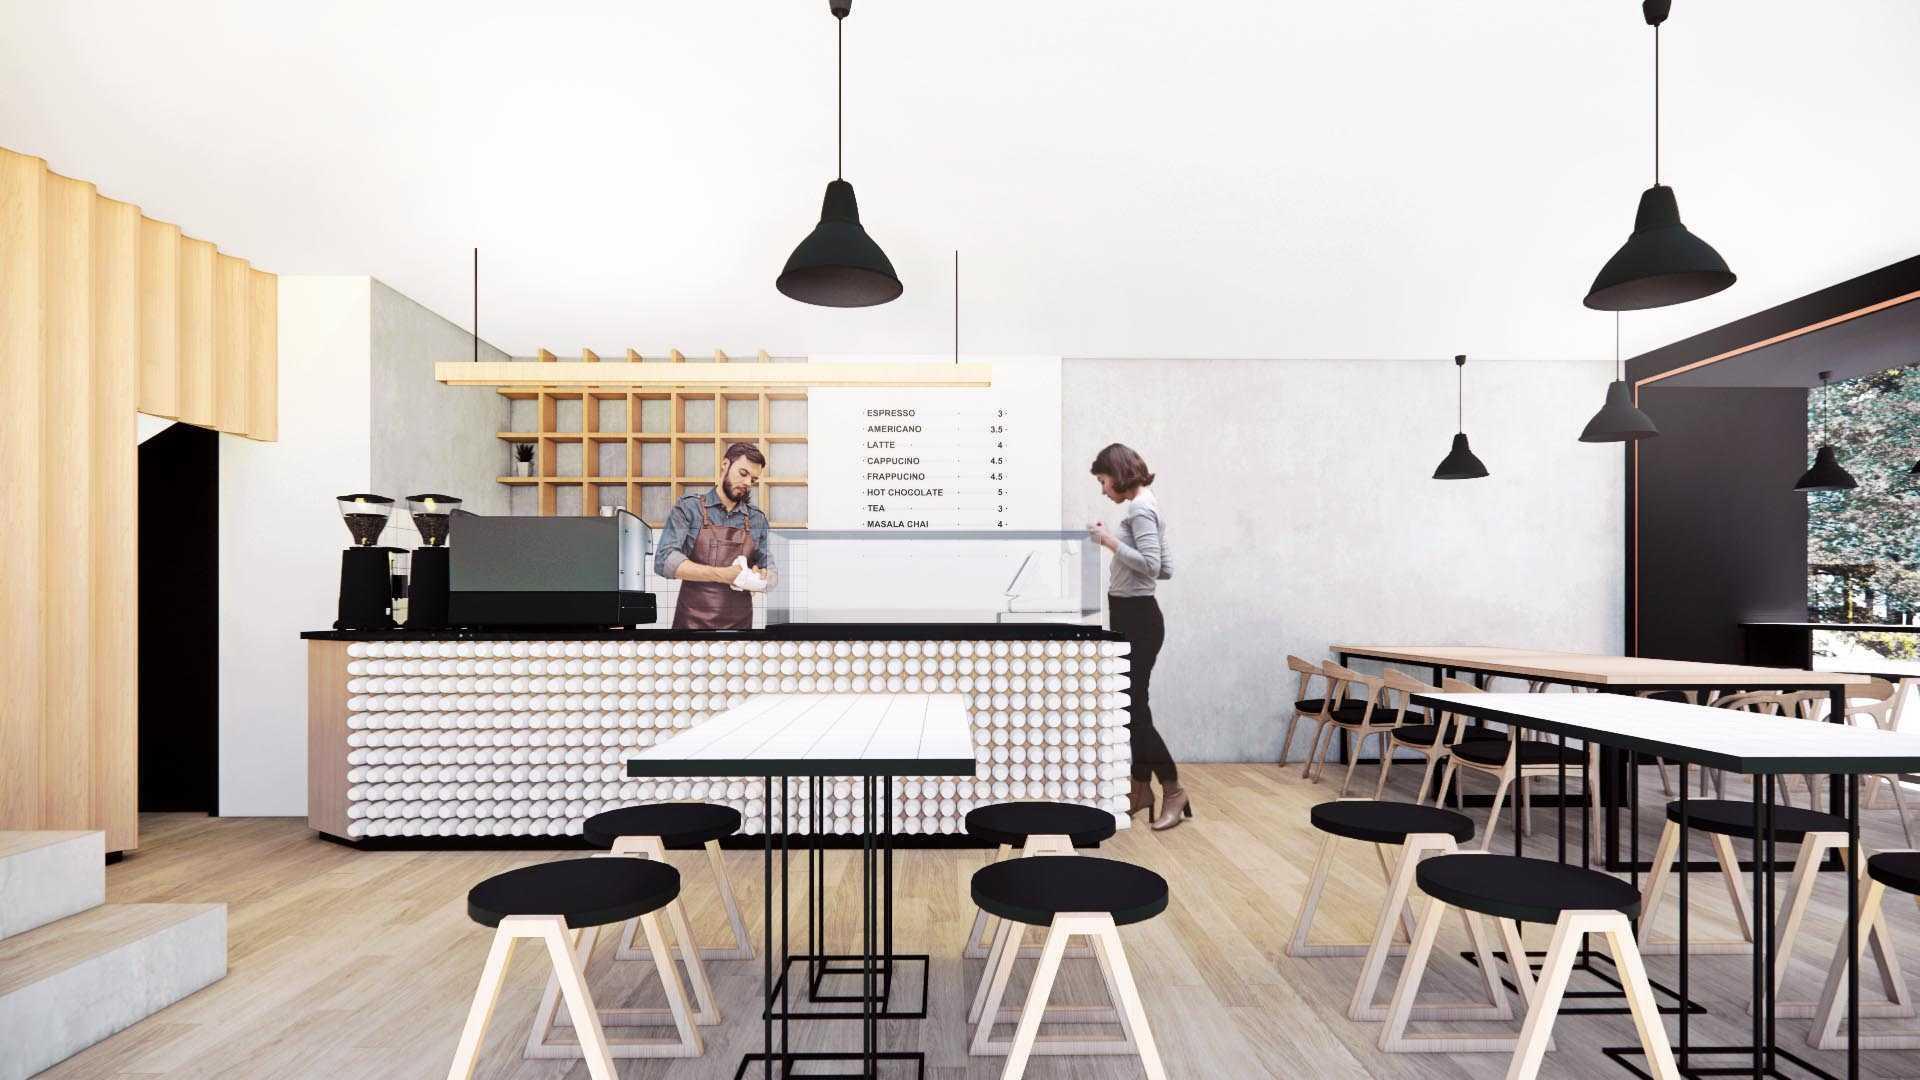 Sume Interior Bvr Coffee Shop Seminyak, Kuta, Kabupaten Badung, Bali, Indonesia Seminyak, Kuta, Kabupaten Badung, Bali, Indonesia Sume-Interior-Bvr-Coffee-Shop  110282